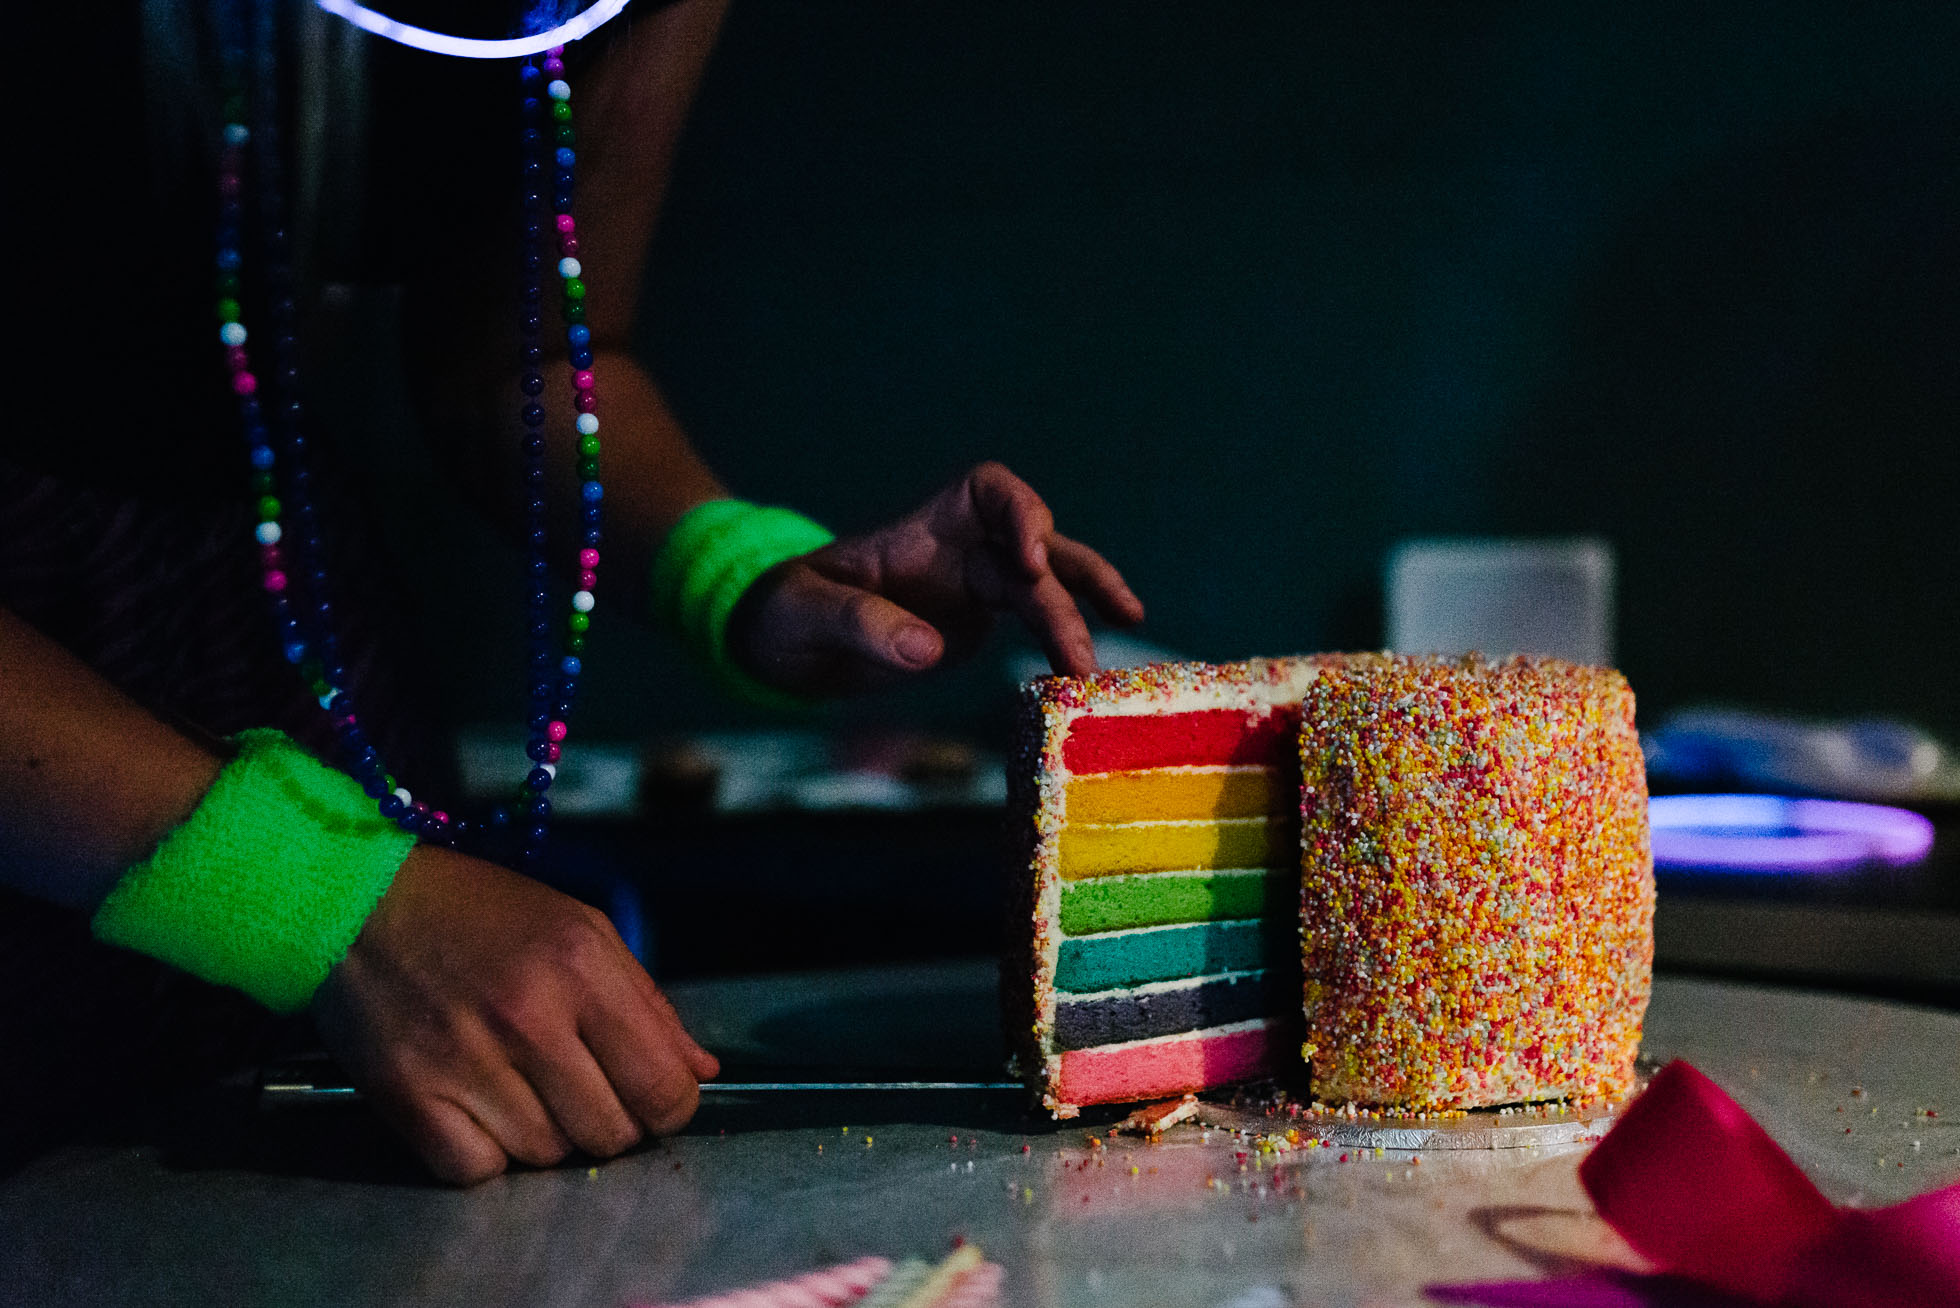 rainbow-birthday-cake-photography-tips.jpg